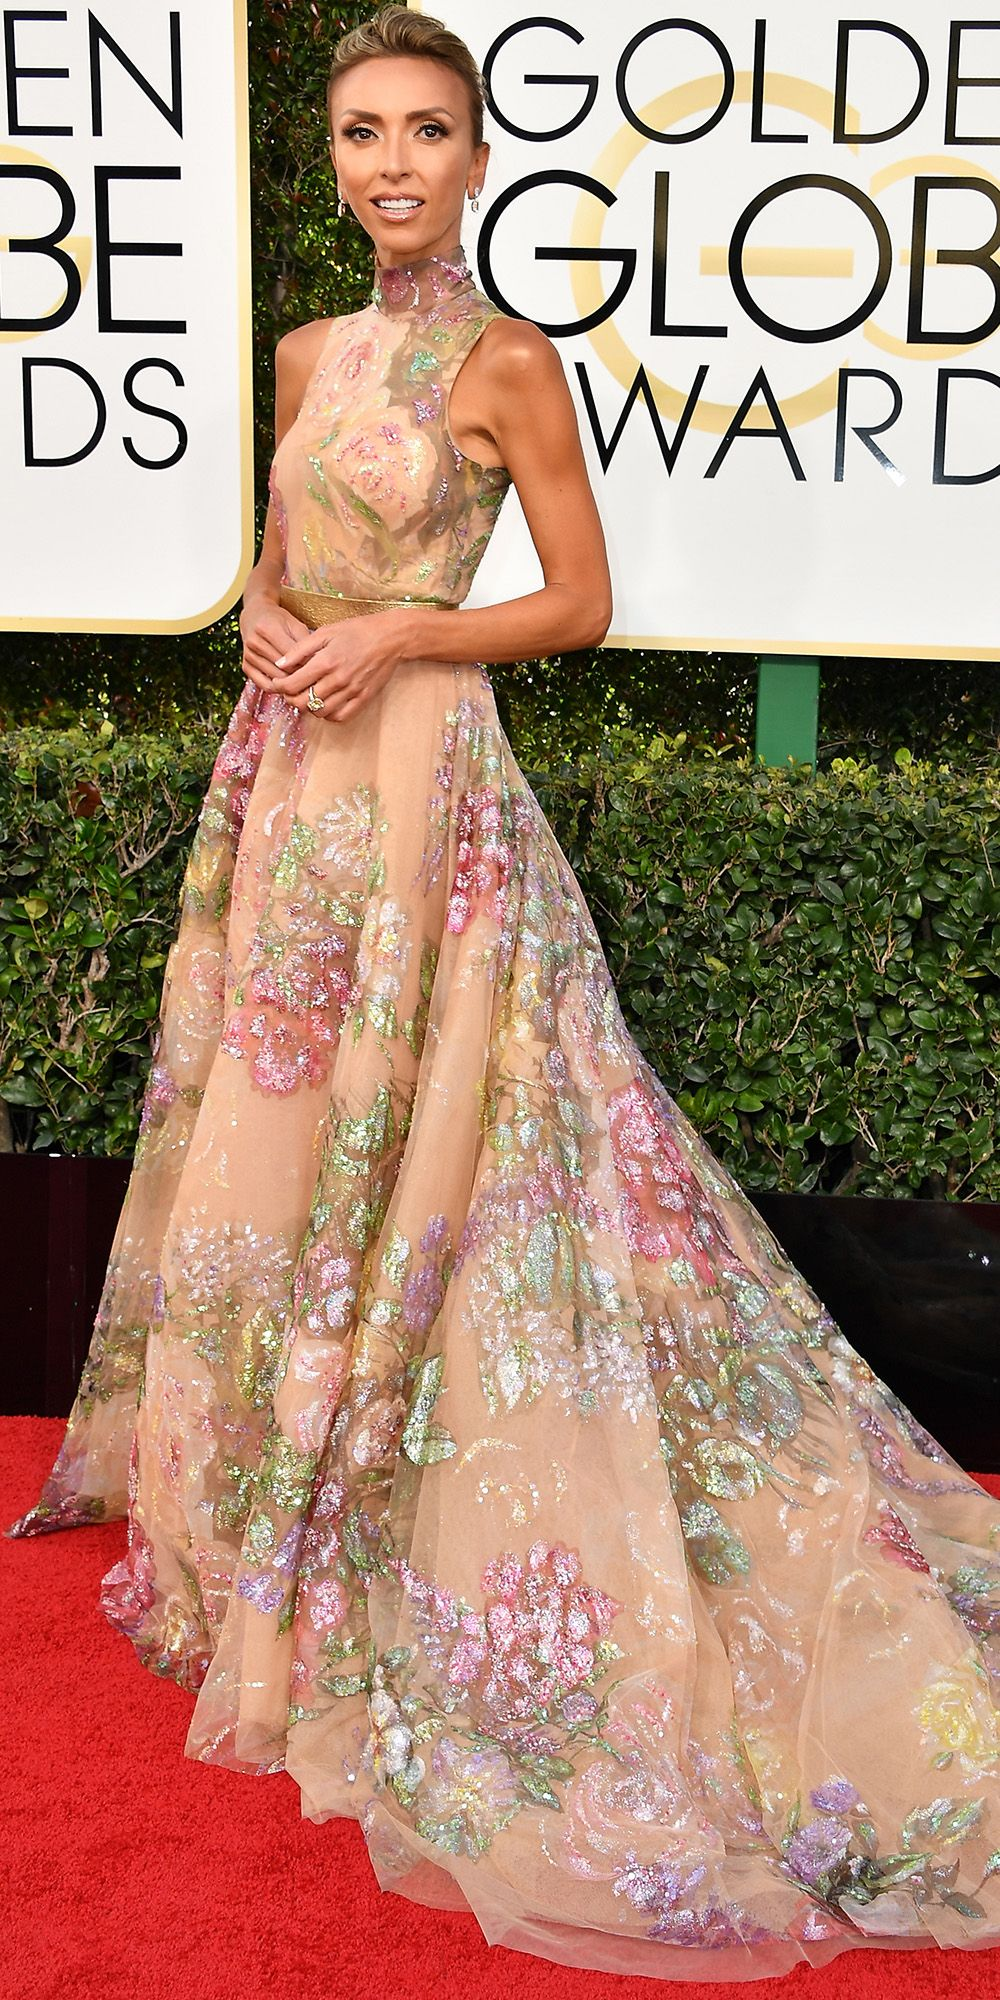 All the Glamorous 2017 Golden Globes Red Carpet Arrivals